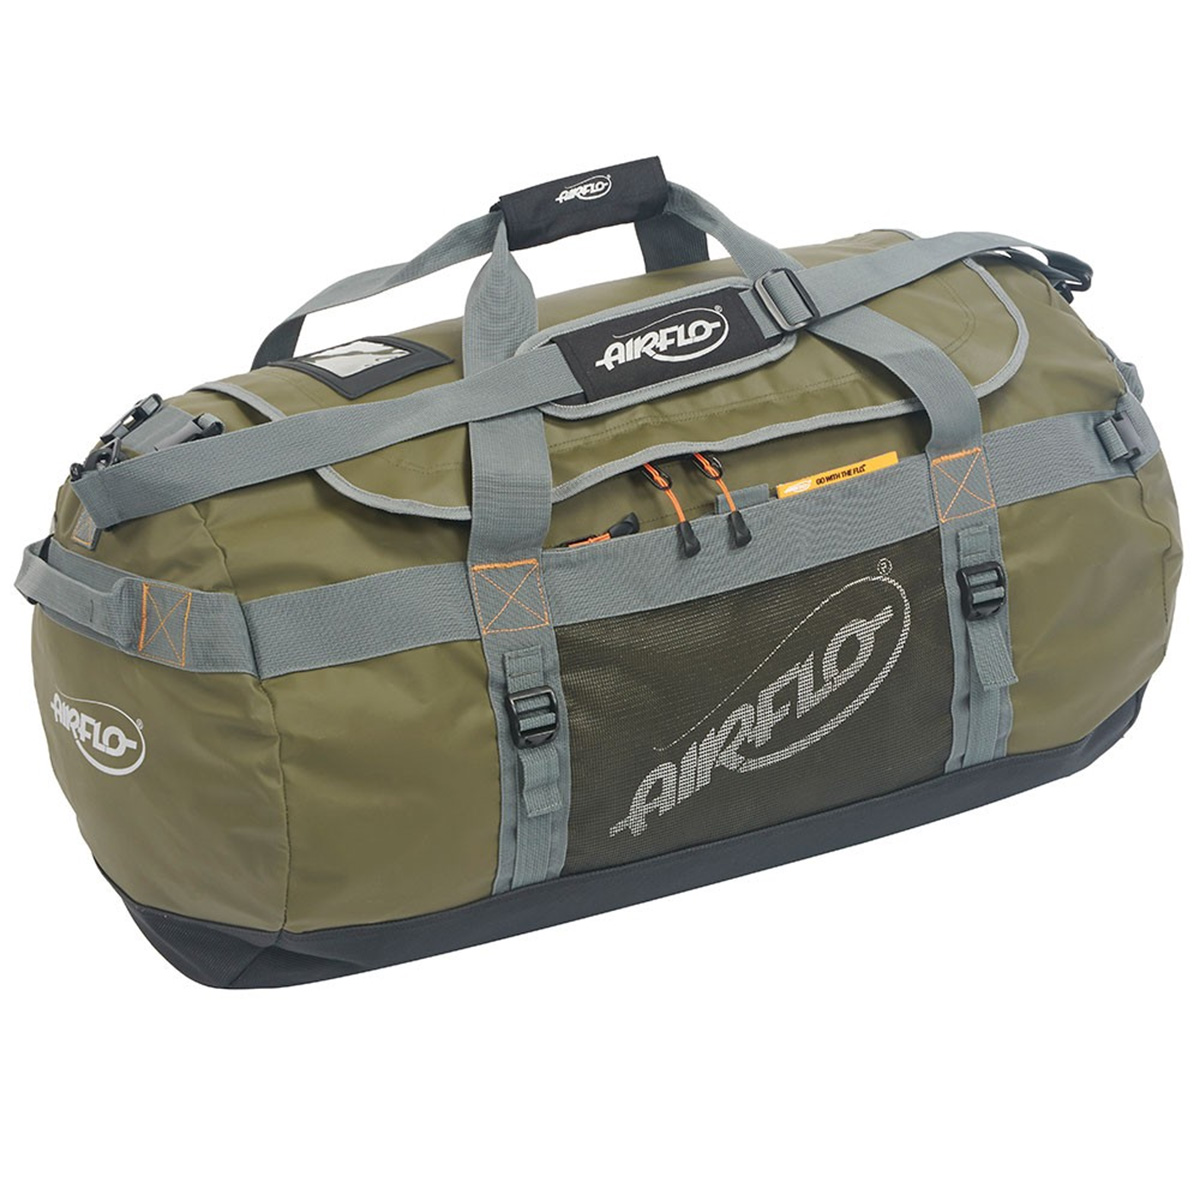 Airflo fly dri 90 litre duffel fishing bags luggage for Fly fishing luggage